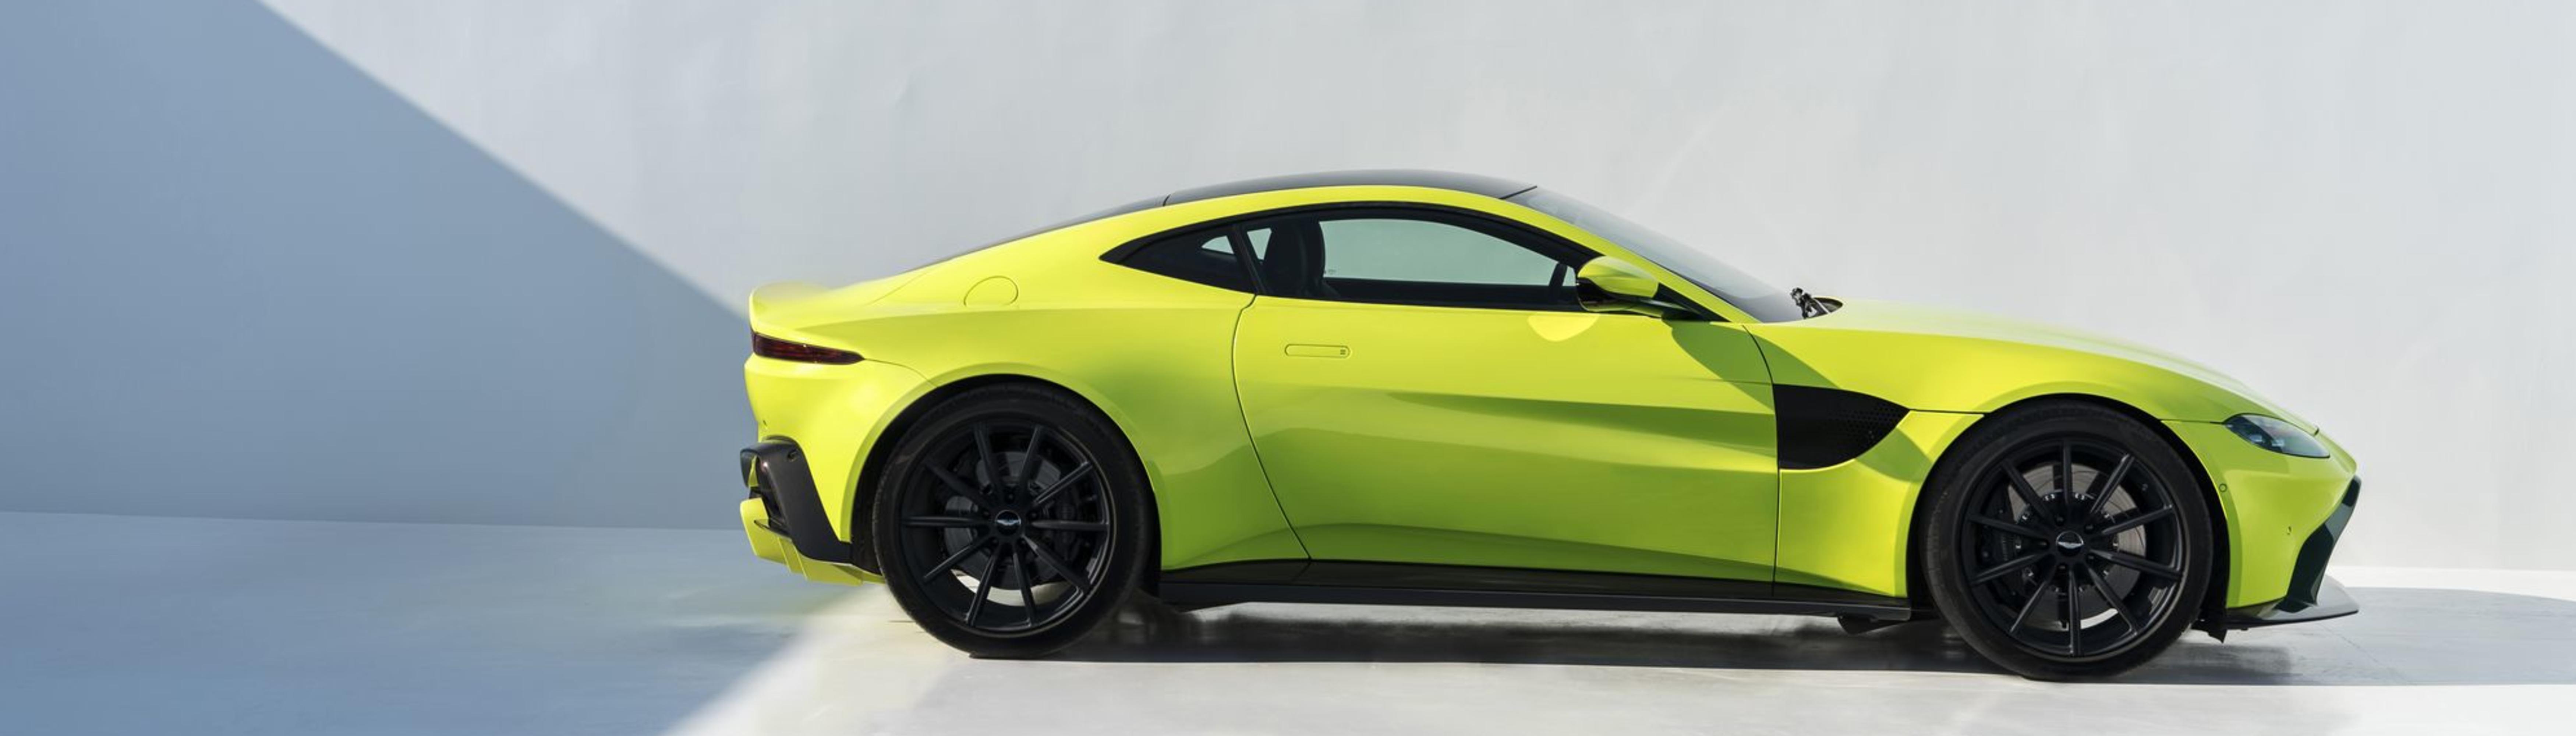 New Aston Martin Cars Aston Martin Nottingham